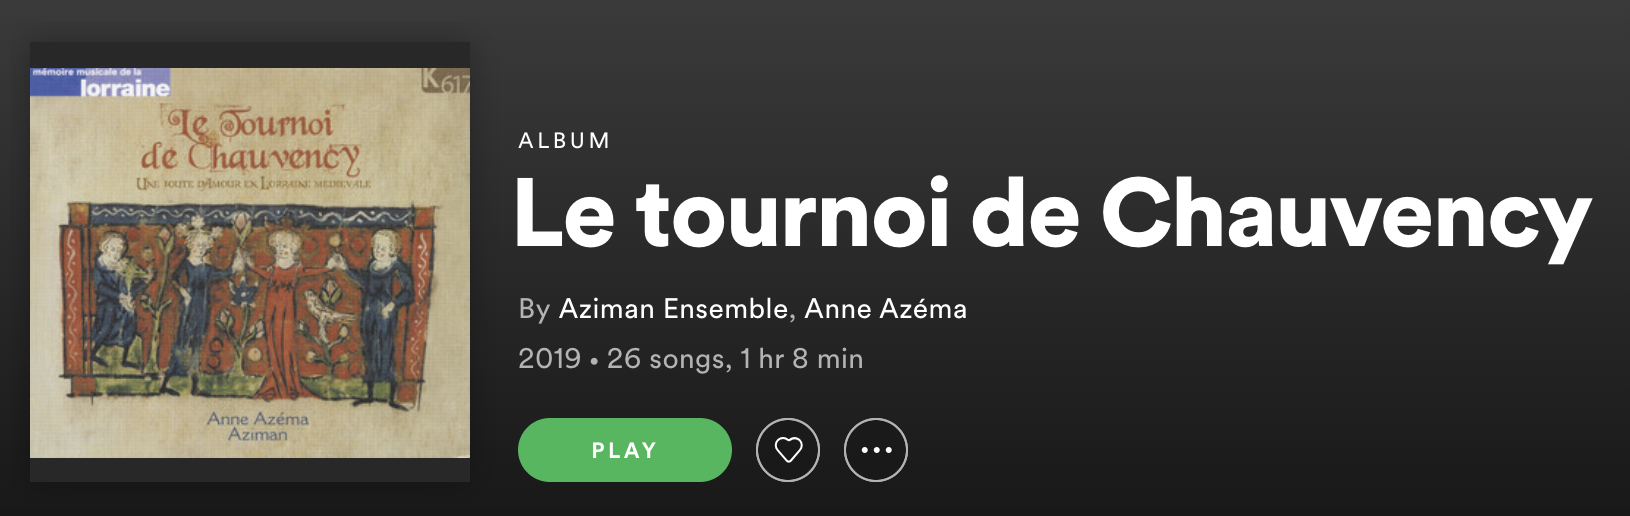 Screenshot from Spotify player for Le Tournoi de Chauvency